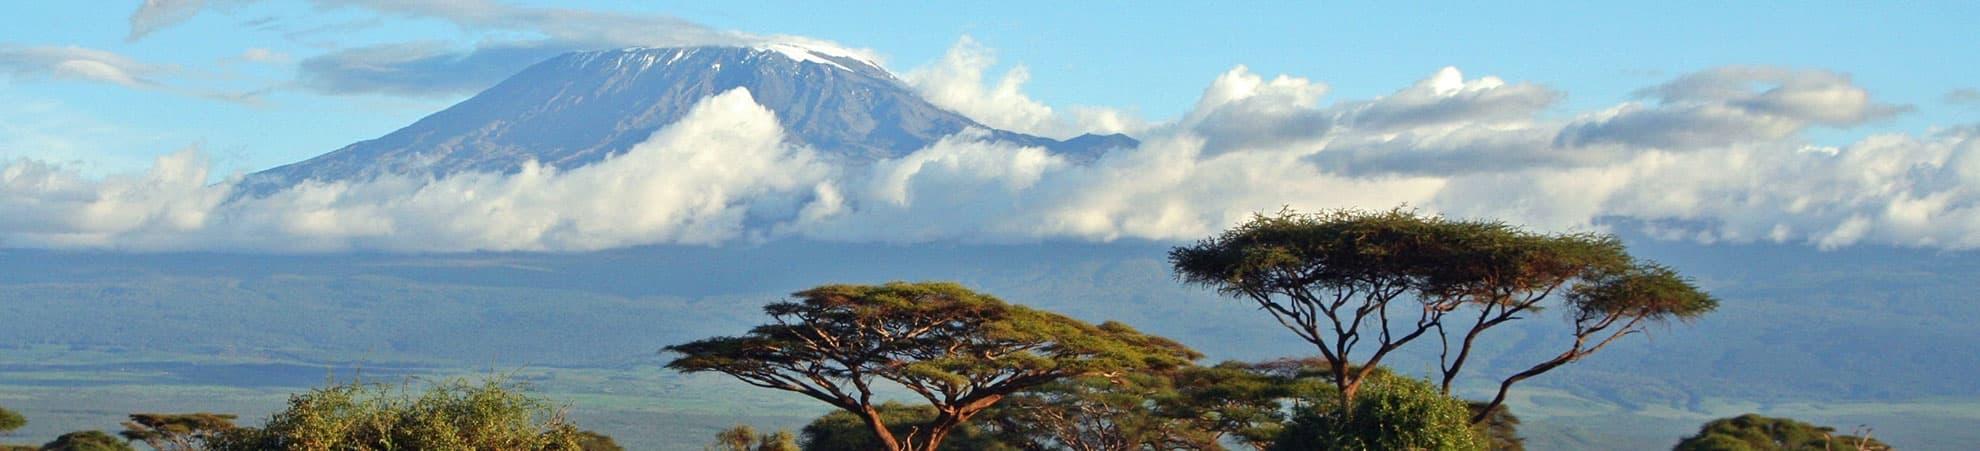 Voyage Le centre - Kenya